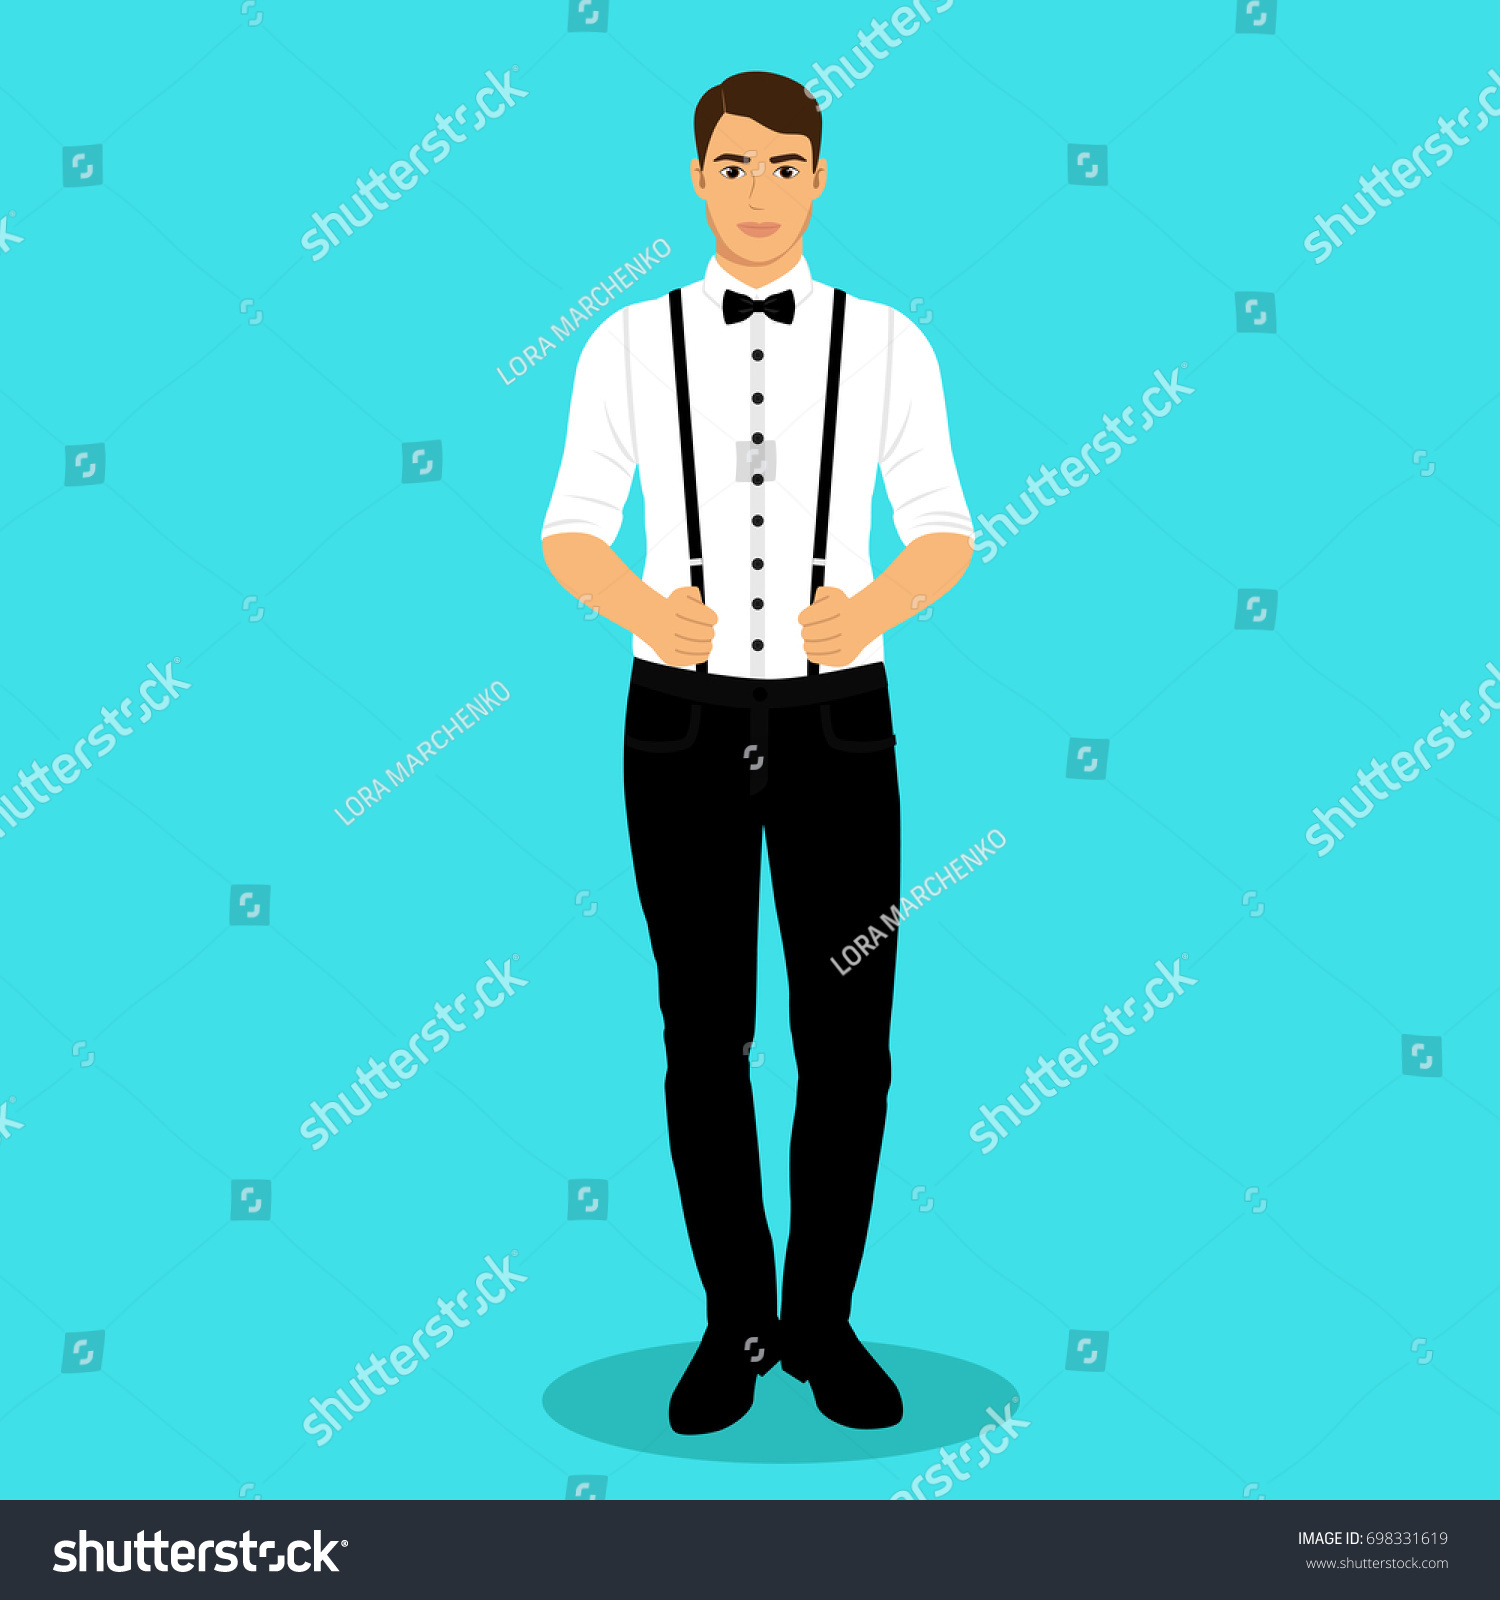 Man Suspenders Groom Clothing Wedding Mens Stock Photo (Photo ...